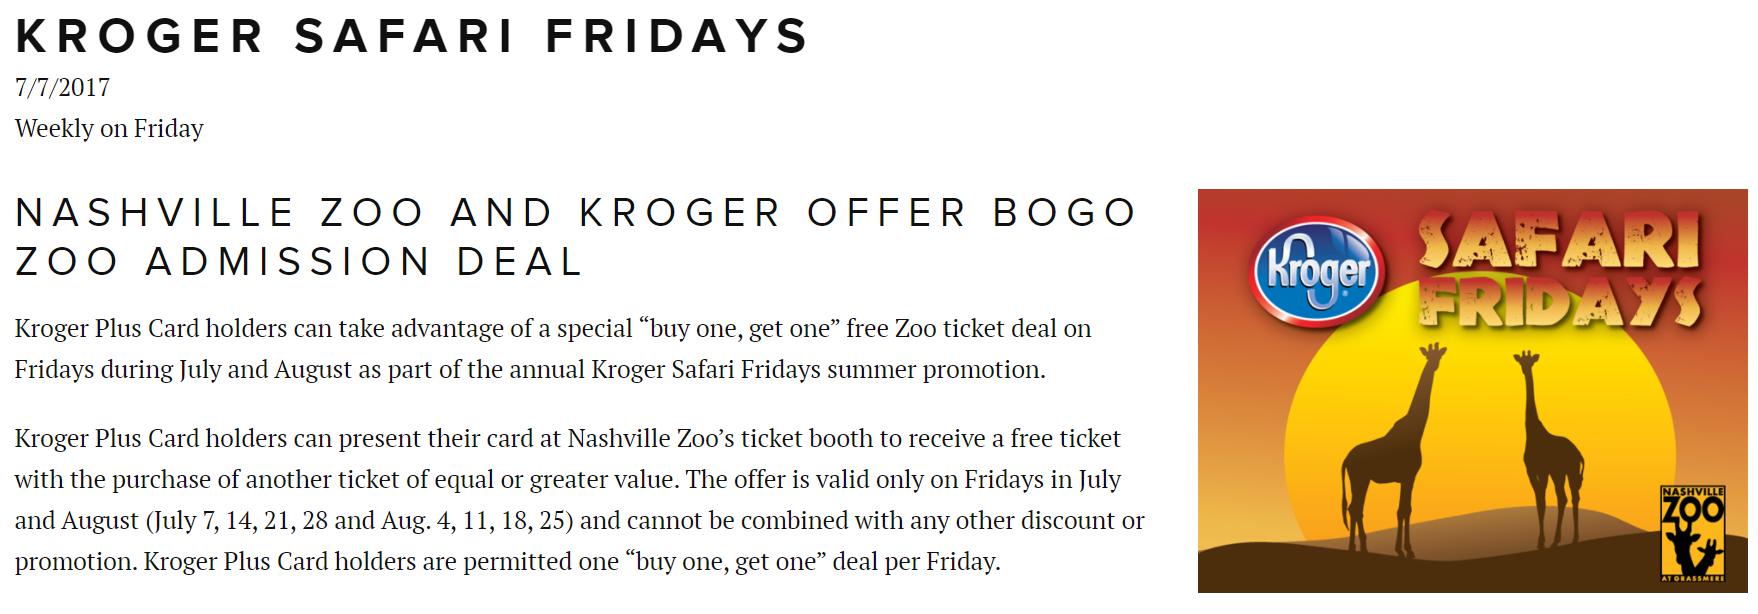 Nashville zoo coupons discounts